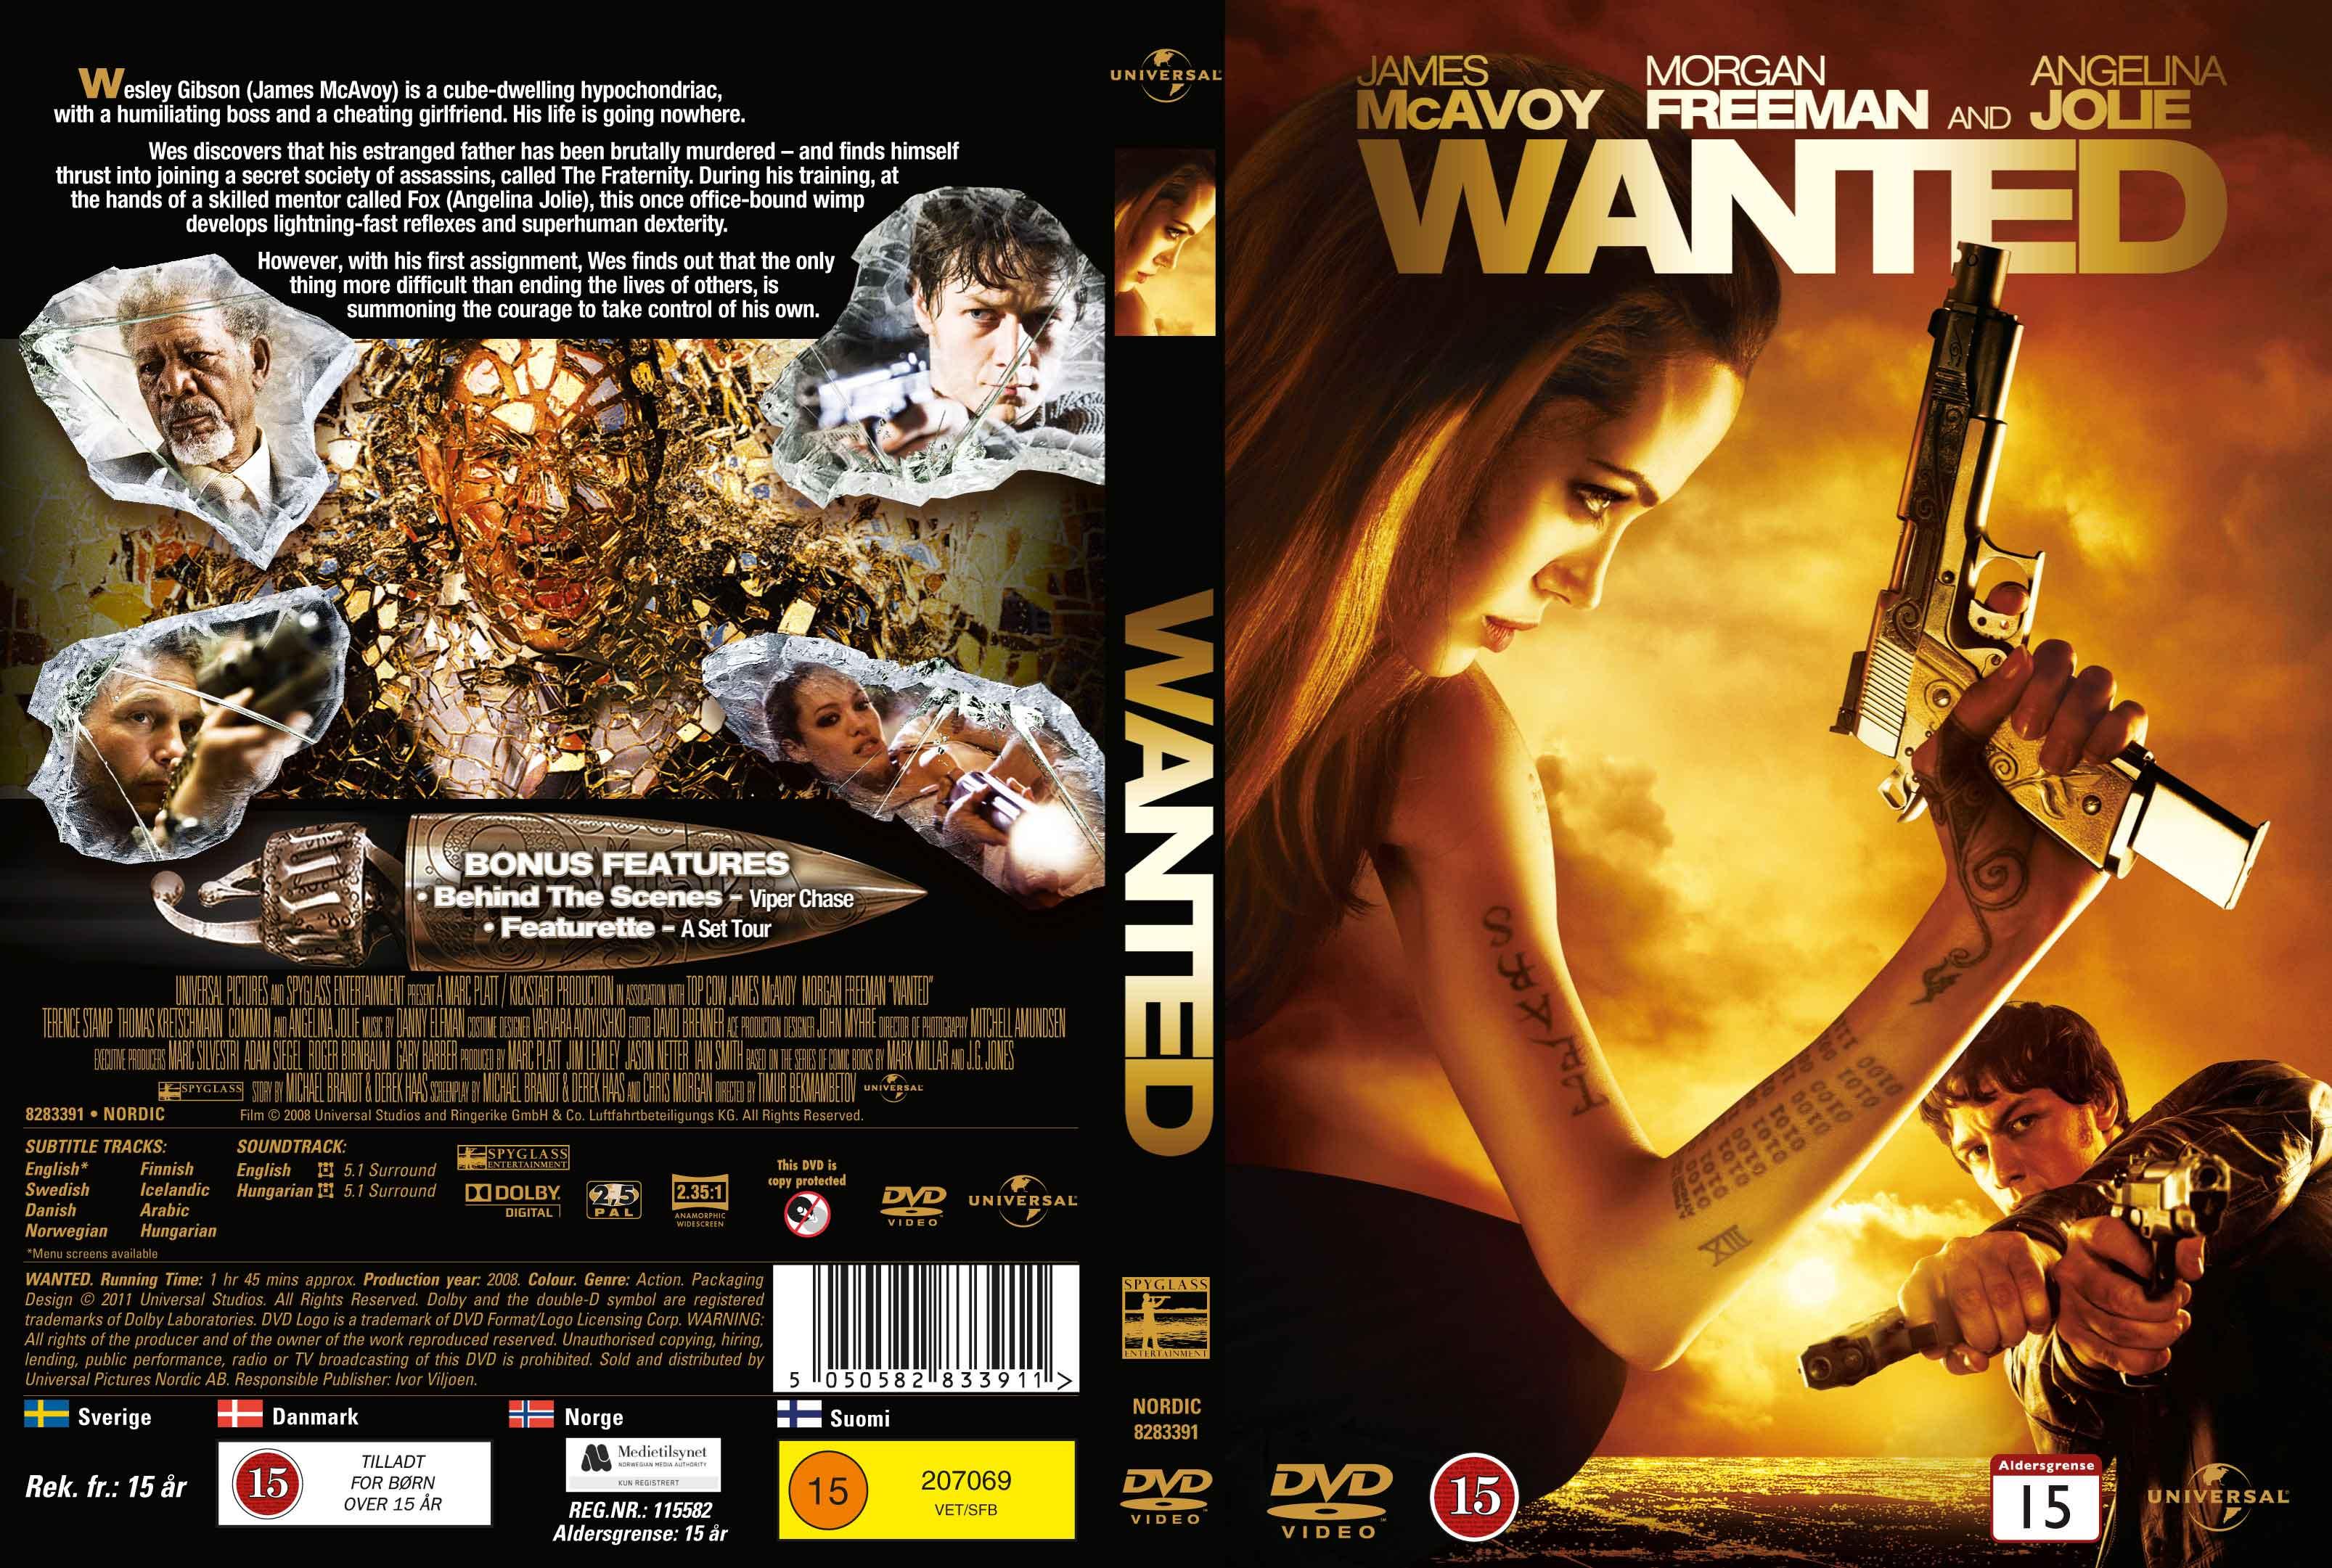 2008 movie soundtracks